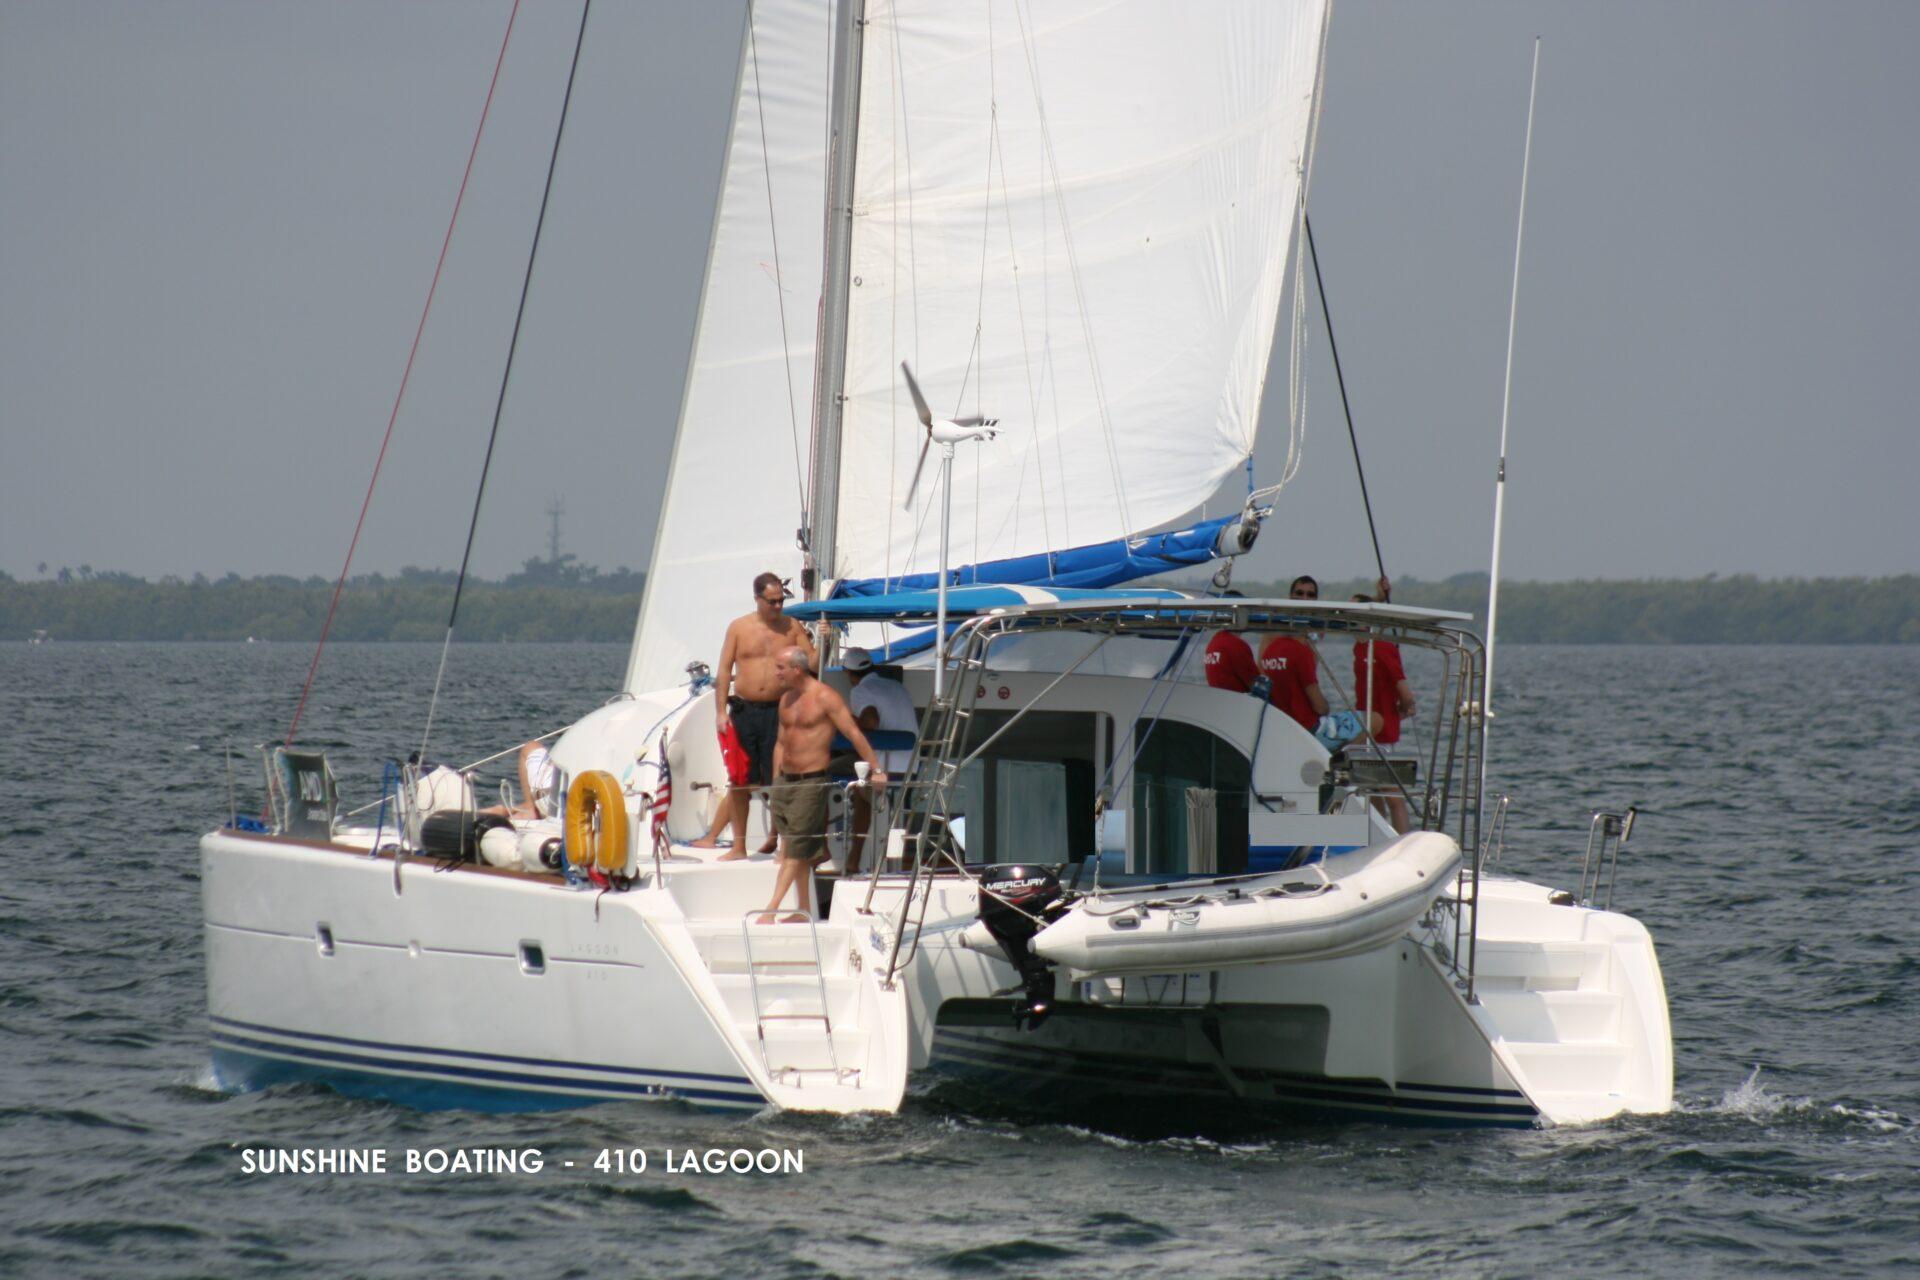 sunshine-boating-lagoon-41-f